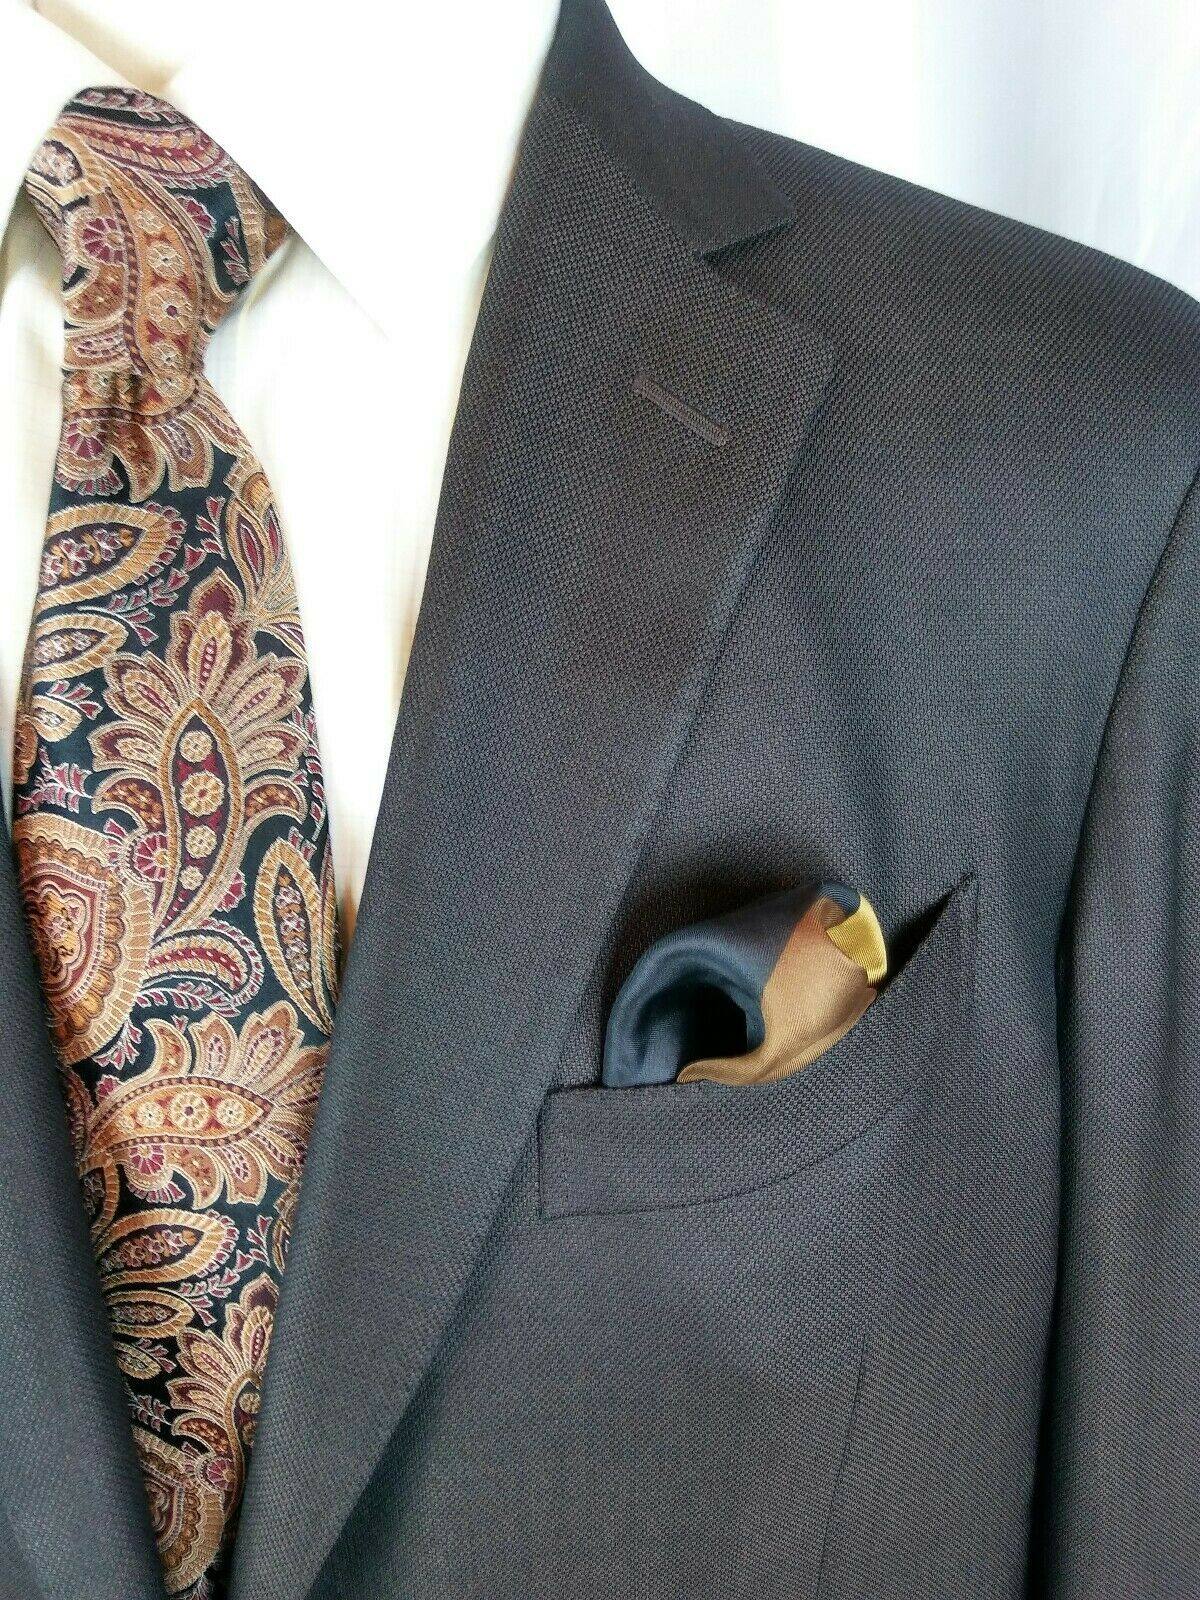 Ermenegildo Zegna Trofeo Silk Blazer 46L Brown 2 Btn D. Vent Surgeon Sleeves